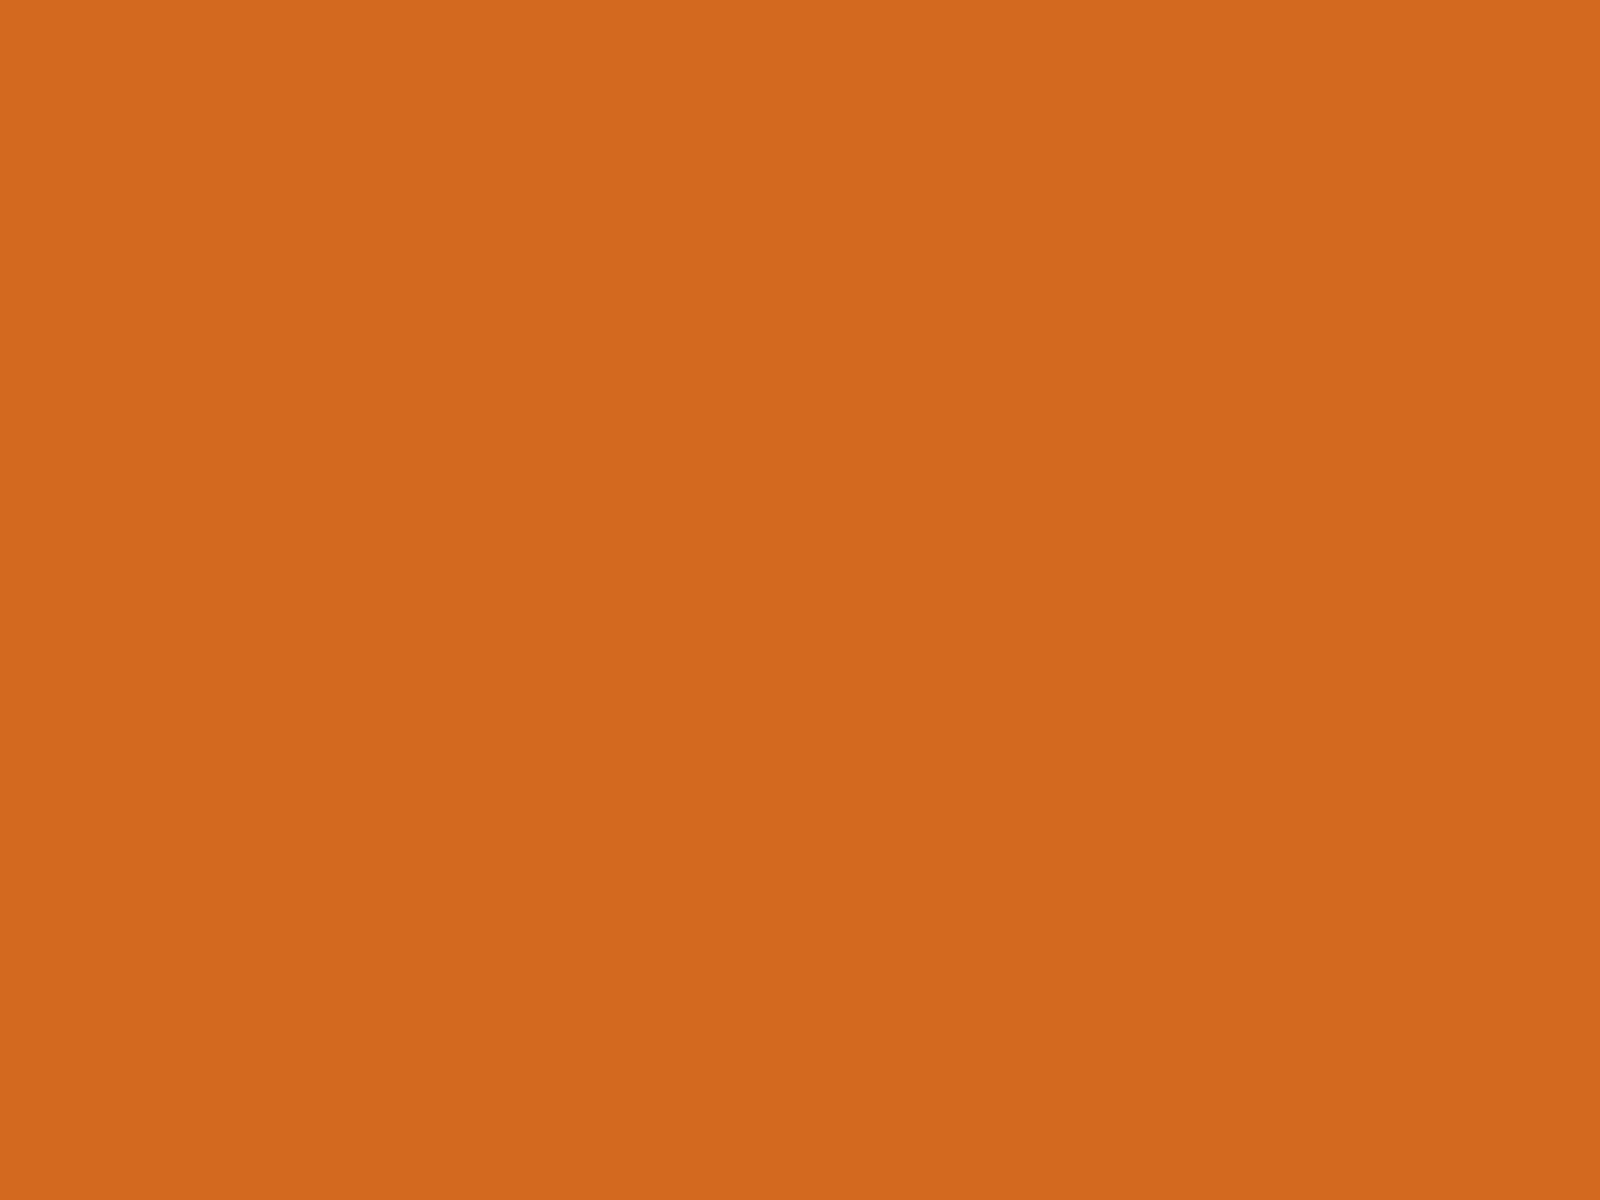 1600x1200 Cinnamon Solid Color Background